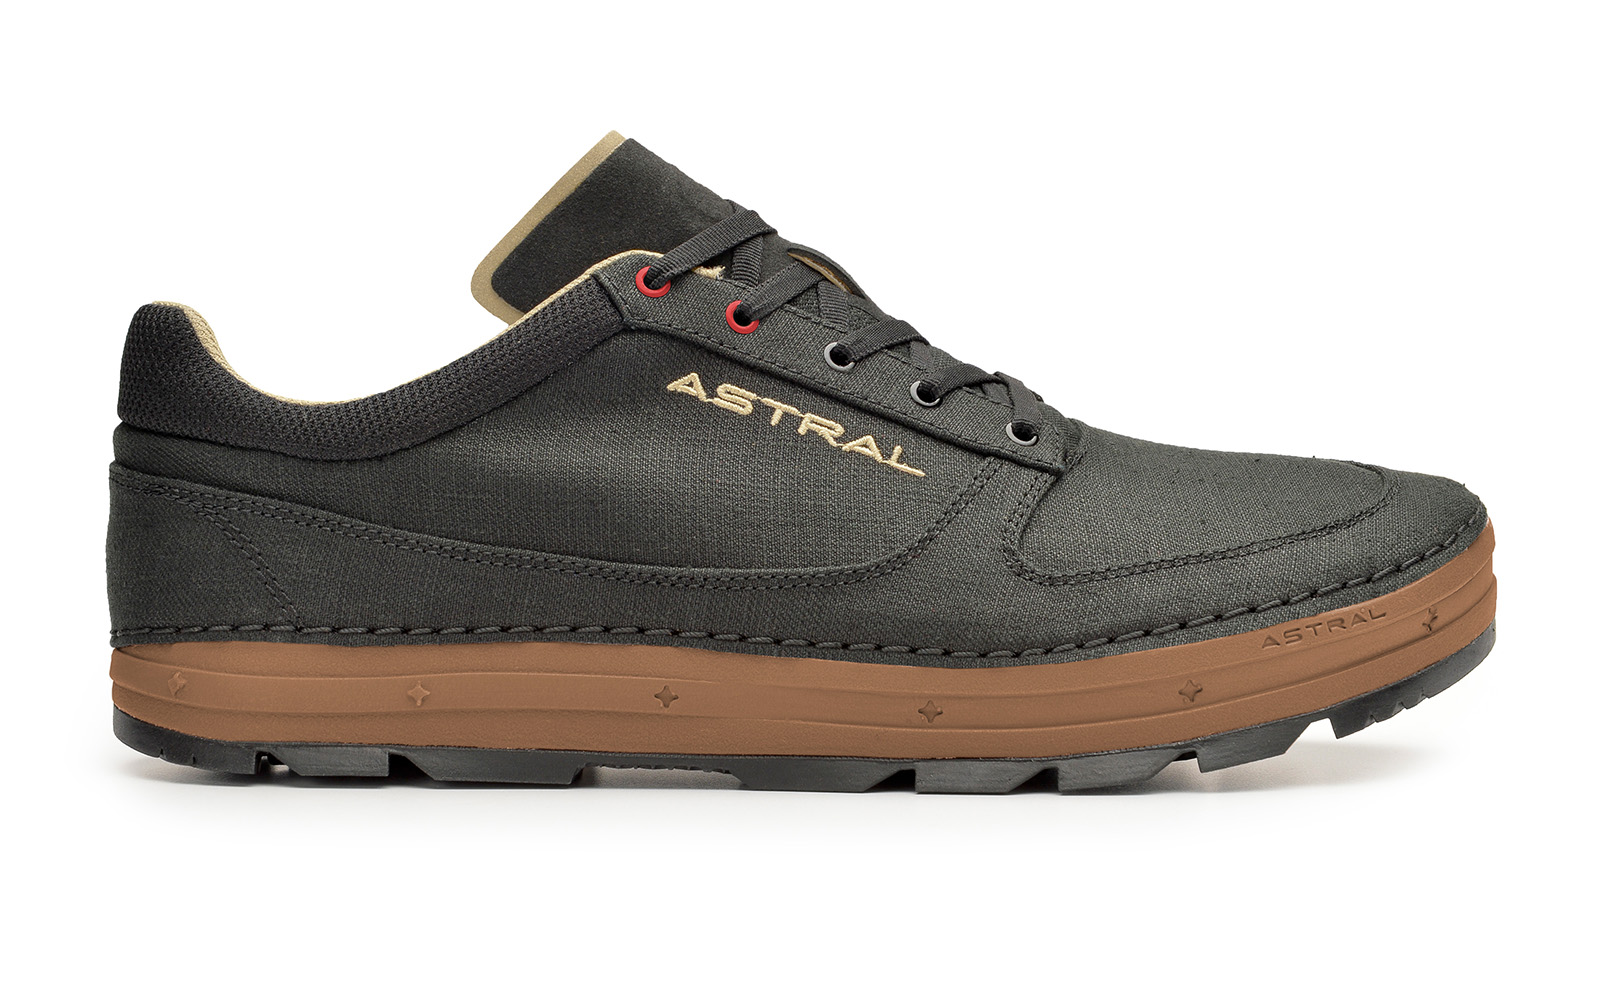 df77d45904e1 Men s Hemp Shoes for Hiking